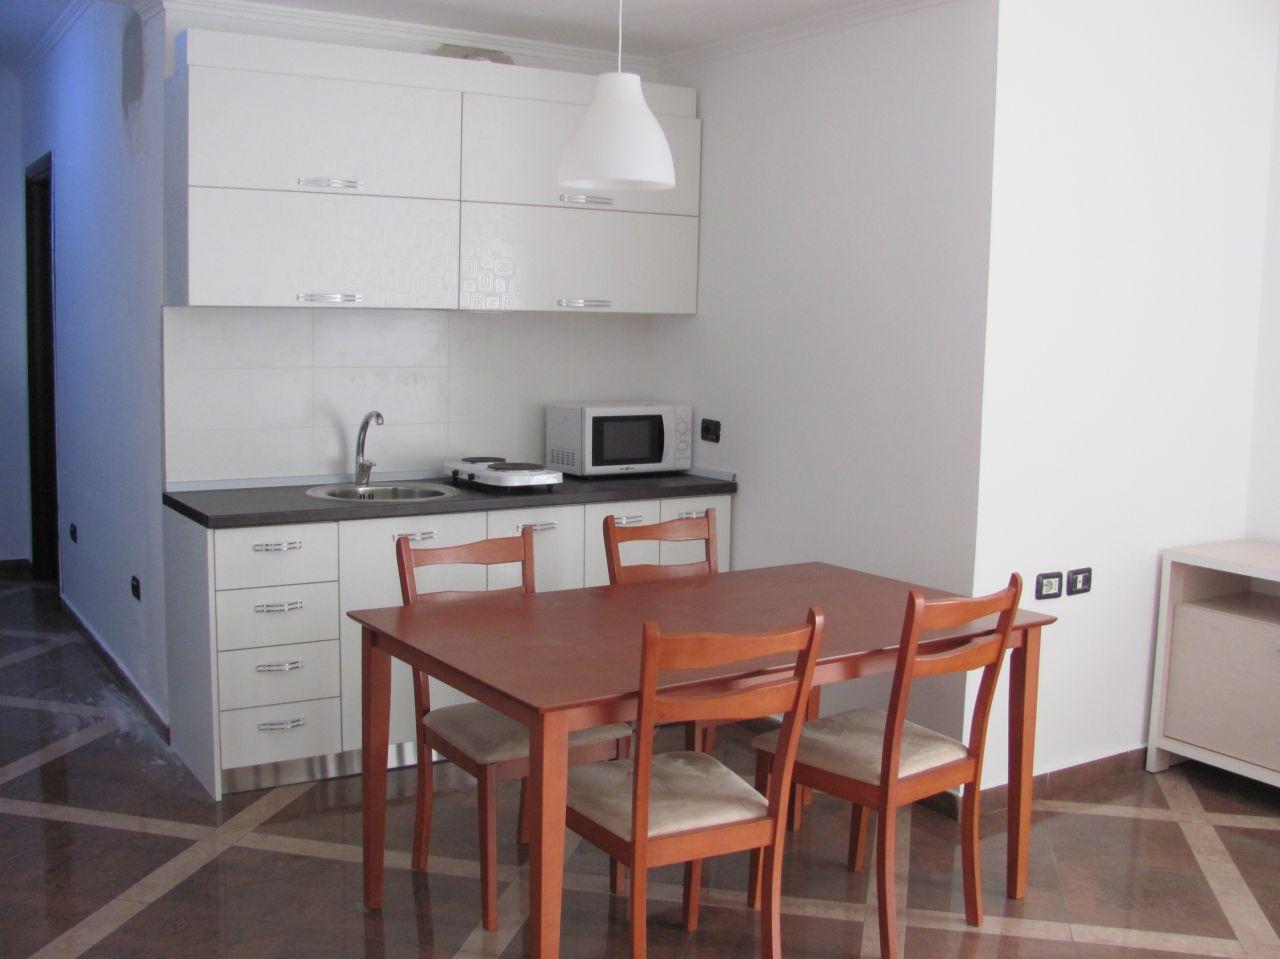 For Rent in Tirana. One Bedroom Apartment in Tirana near Rruga Kavajes